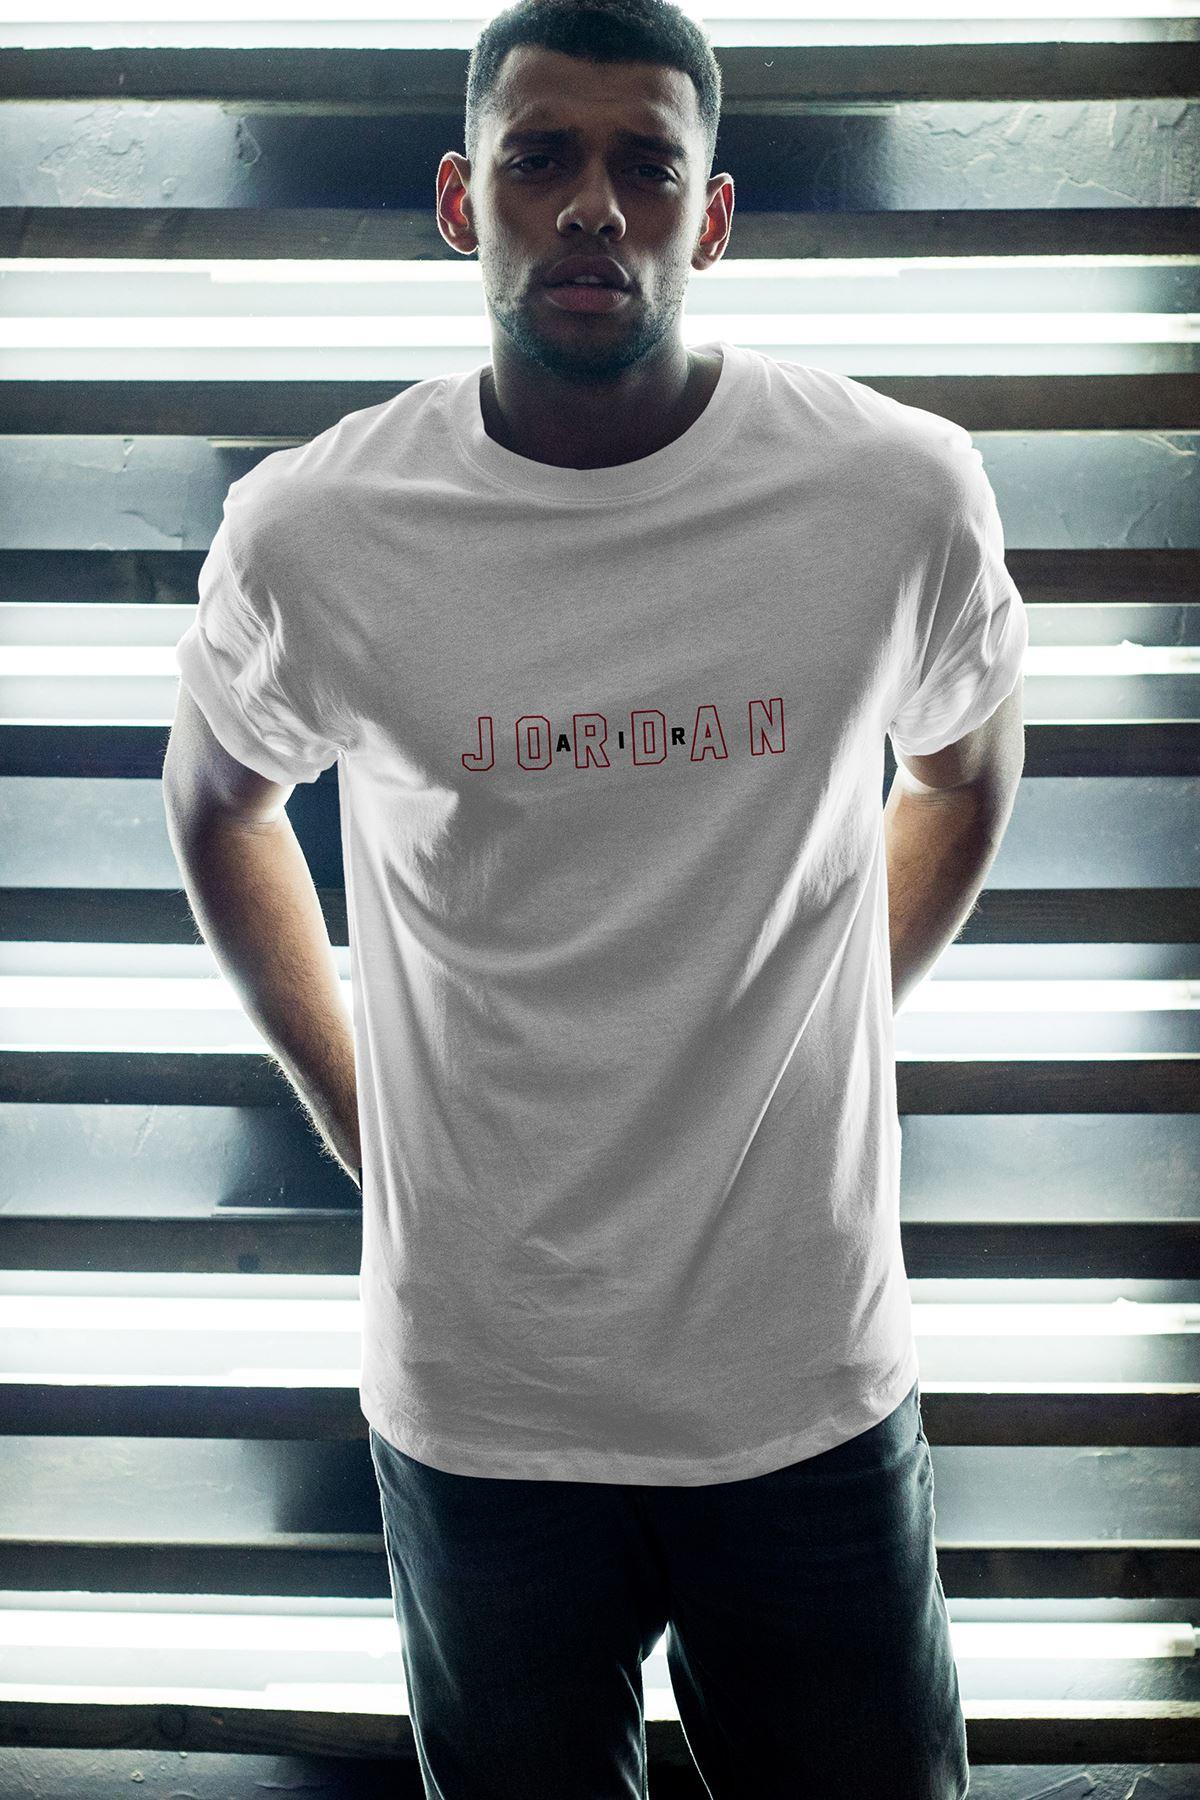 JumpMan 169 Beyaz Erkek Oversize Tshirt - Tişört